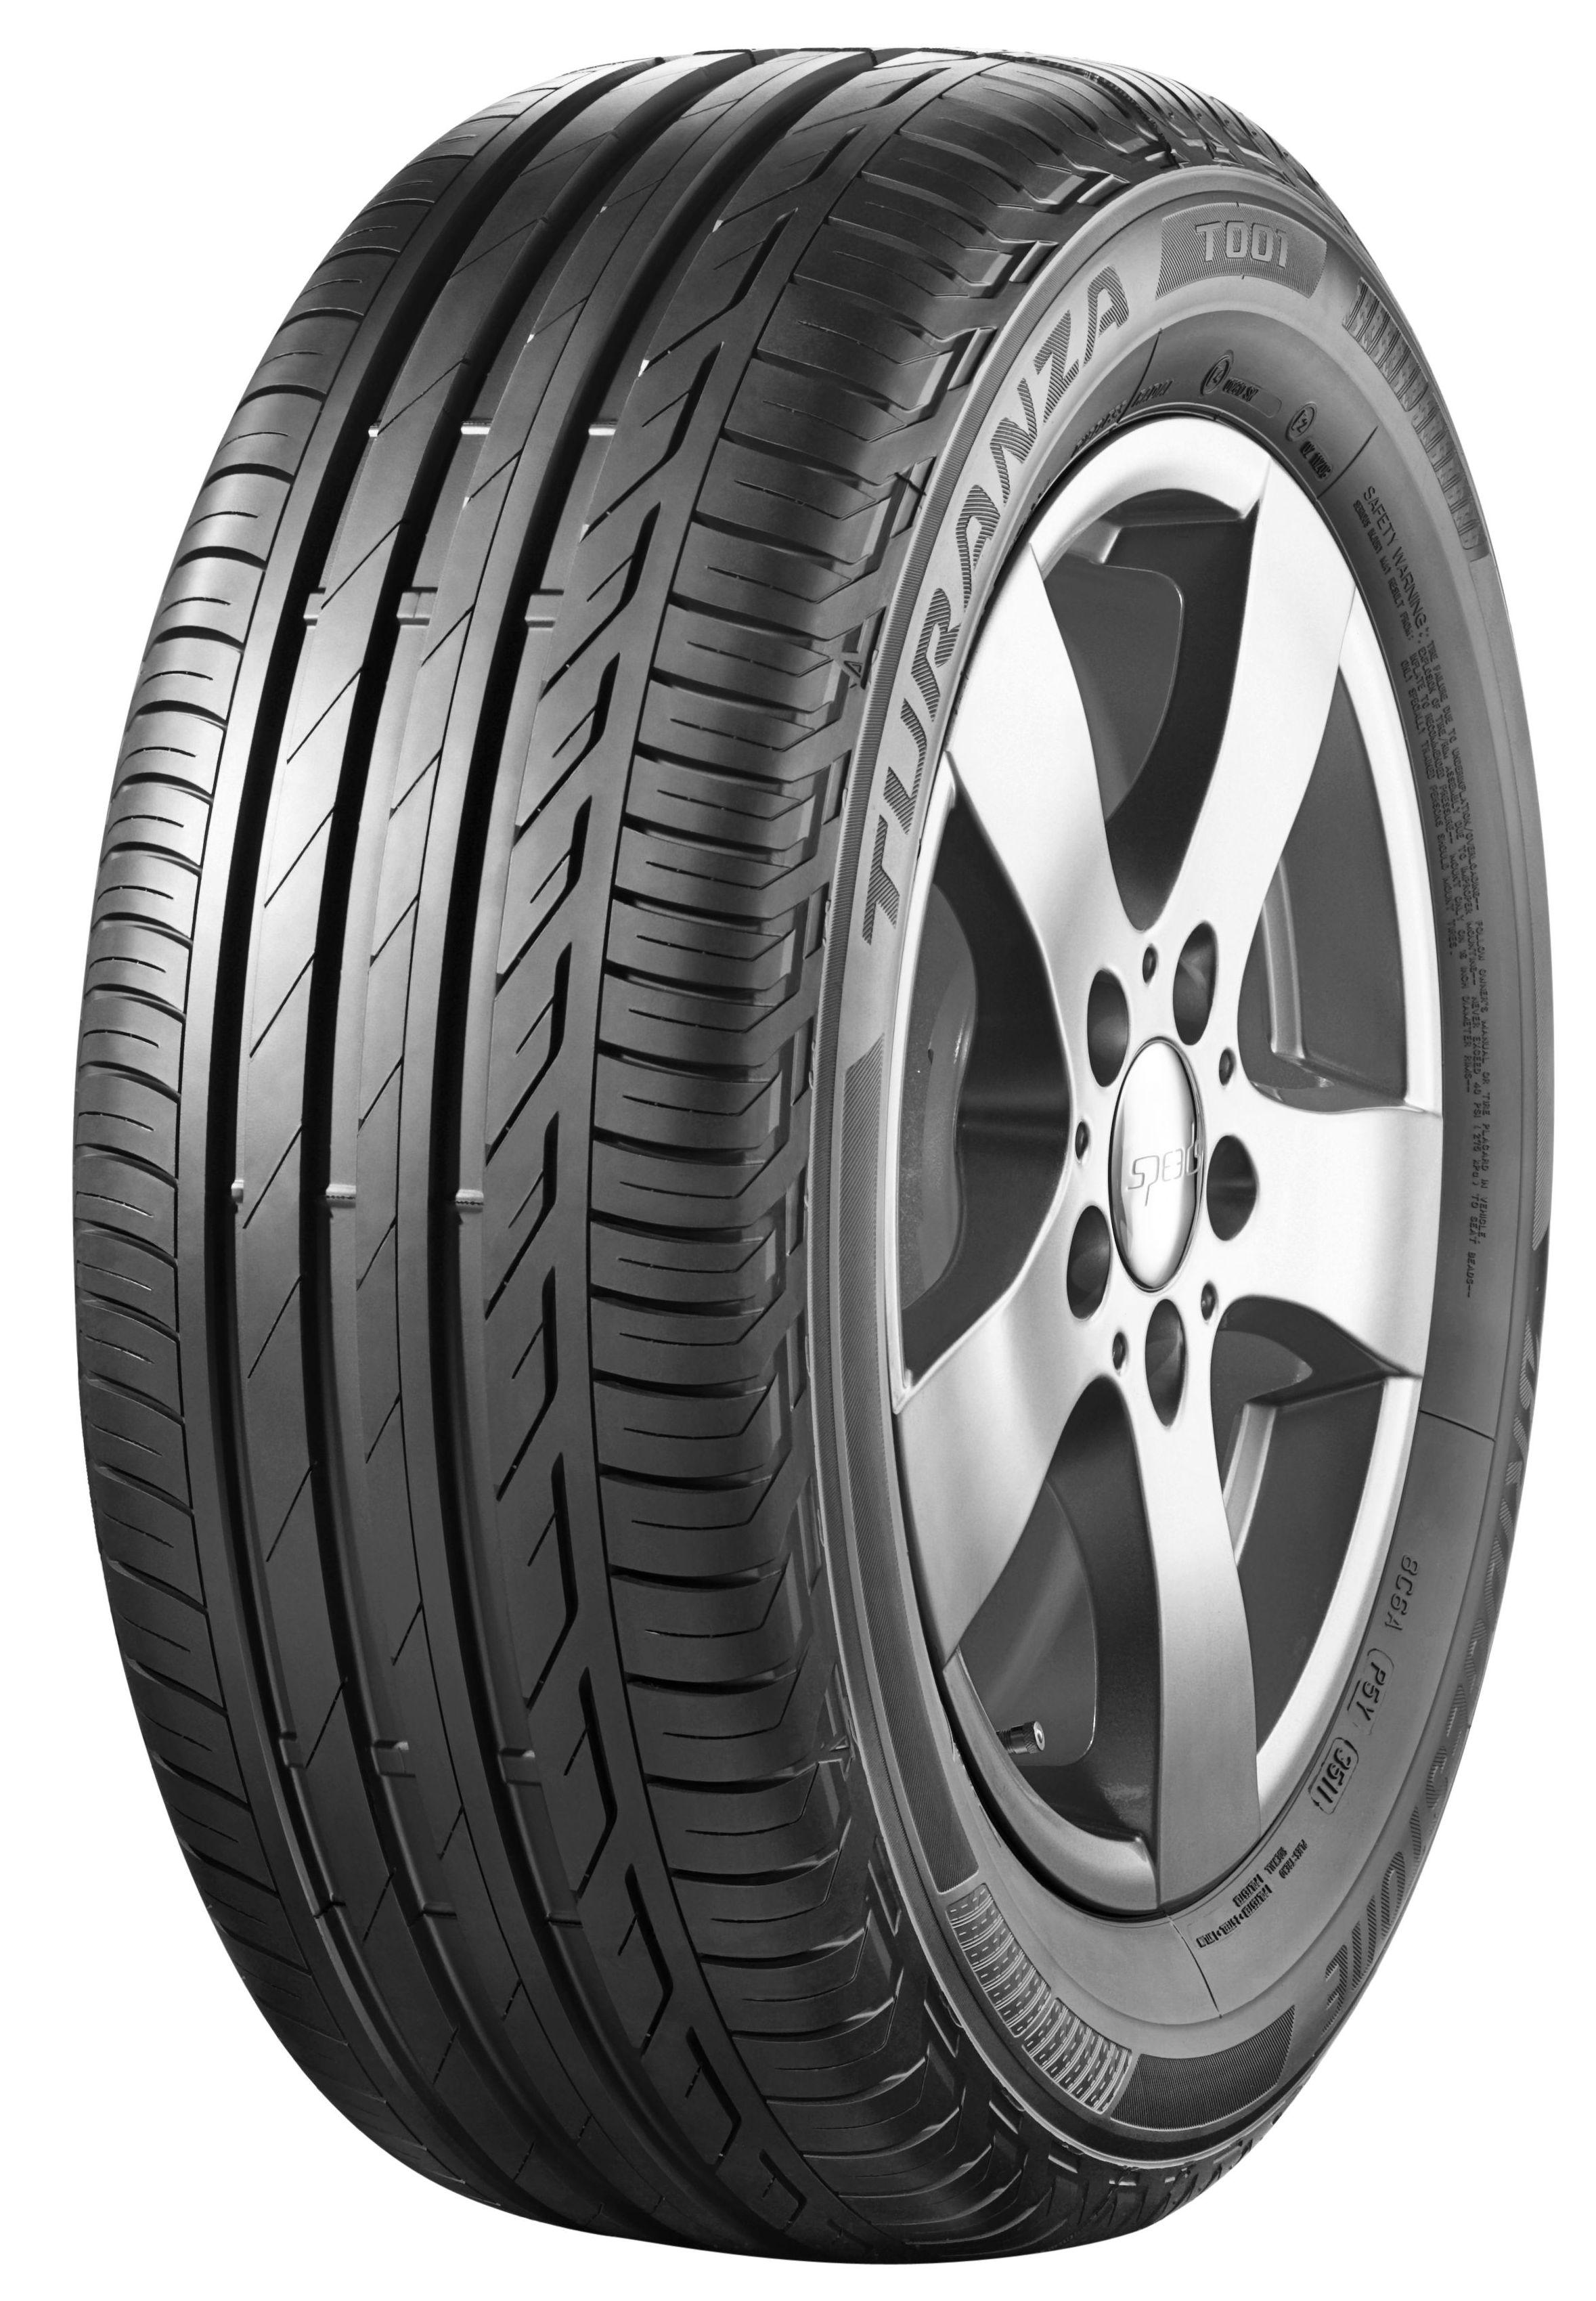 Bridgestone-T 001-185/65R15-88H